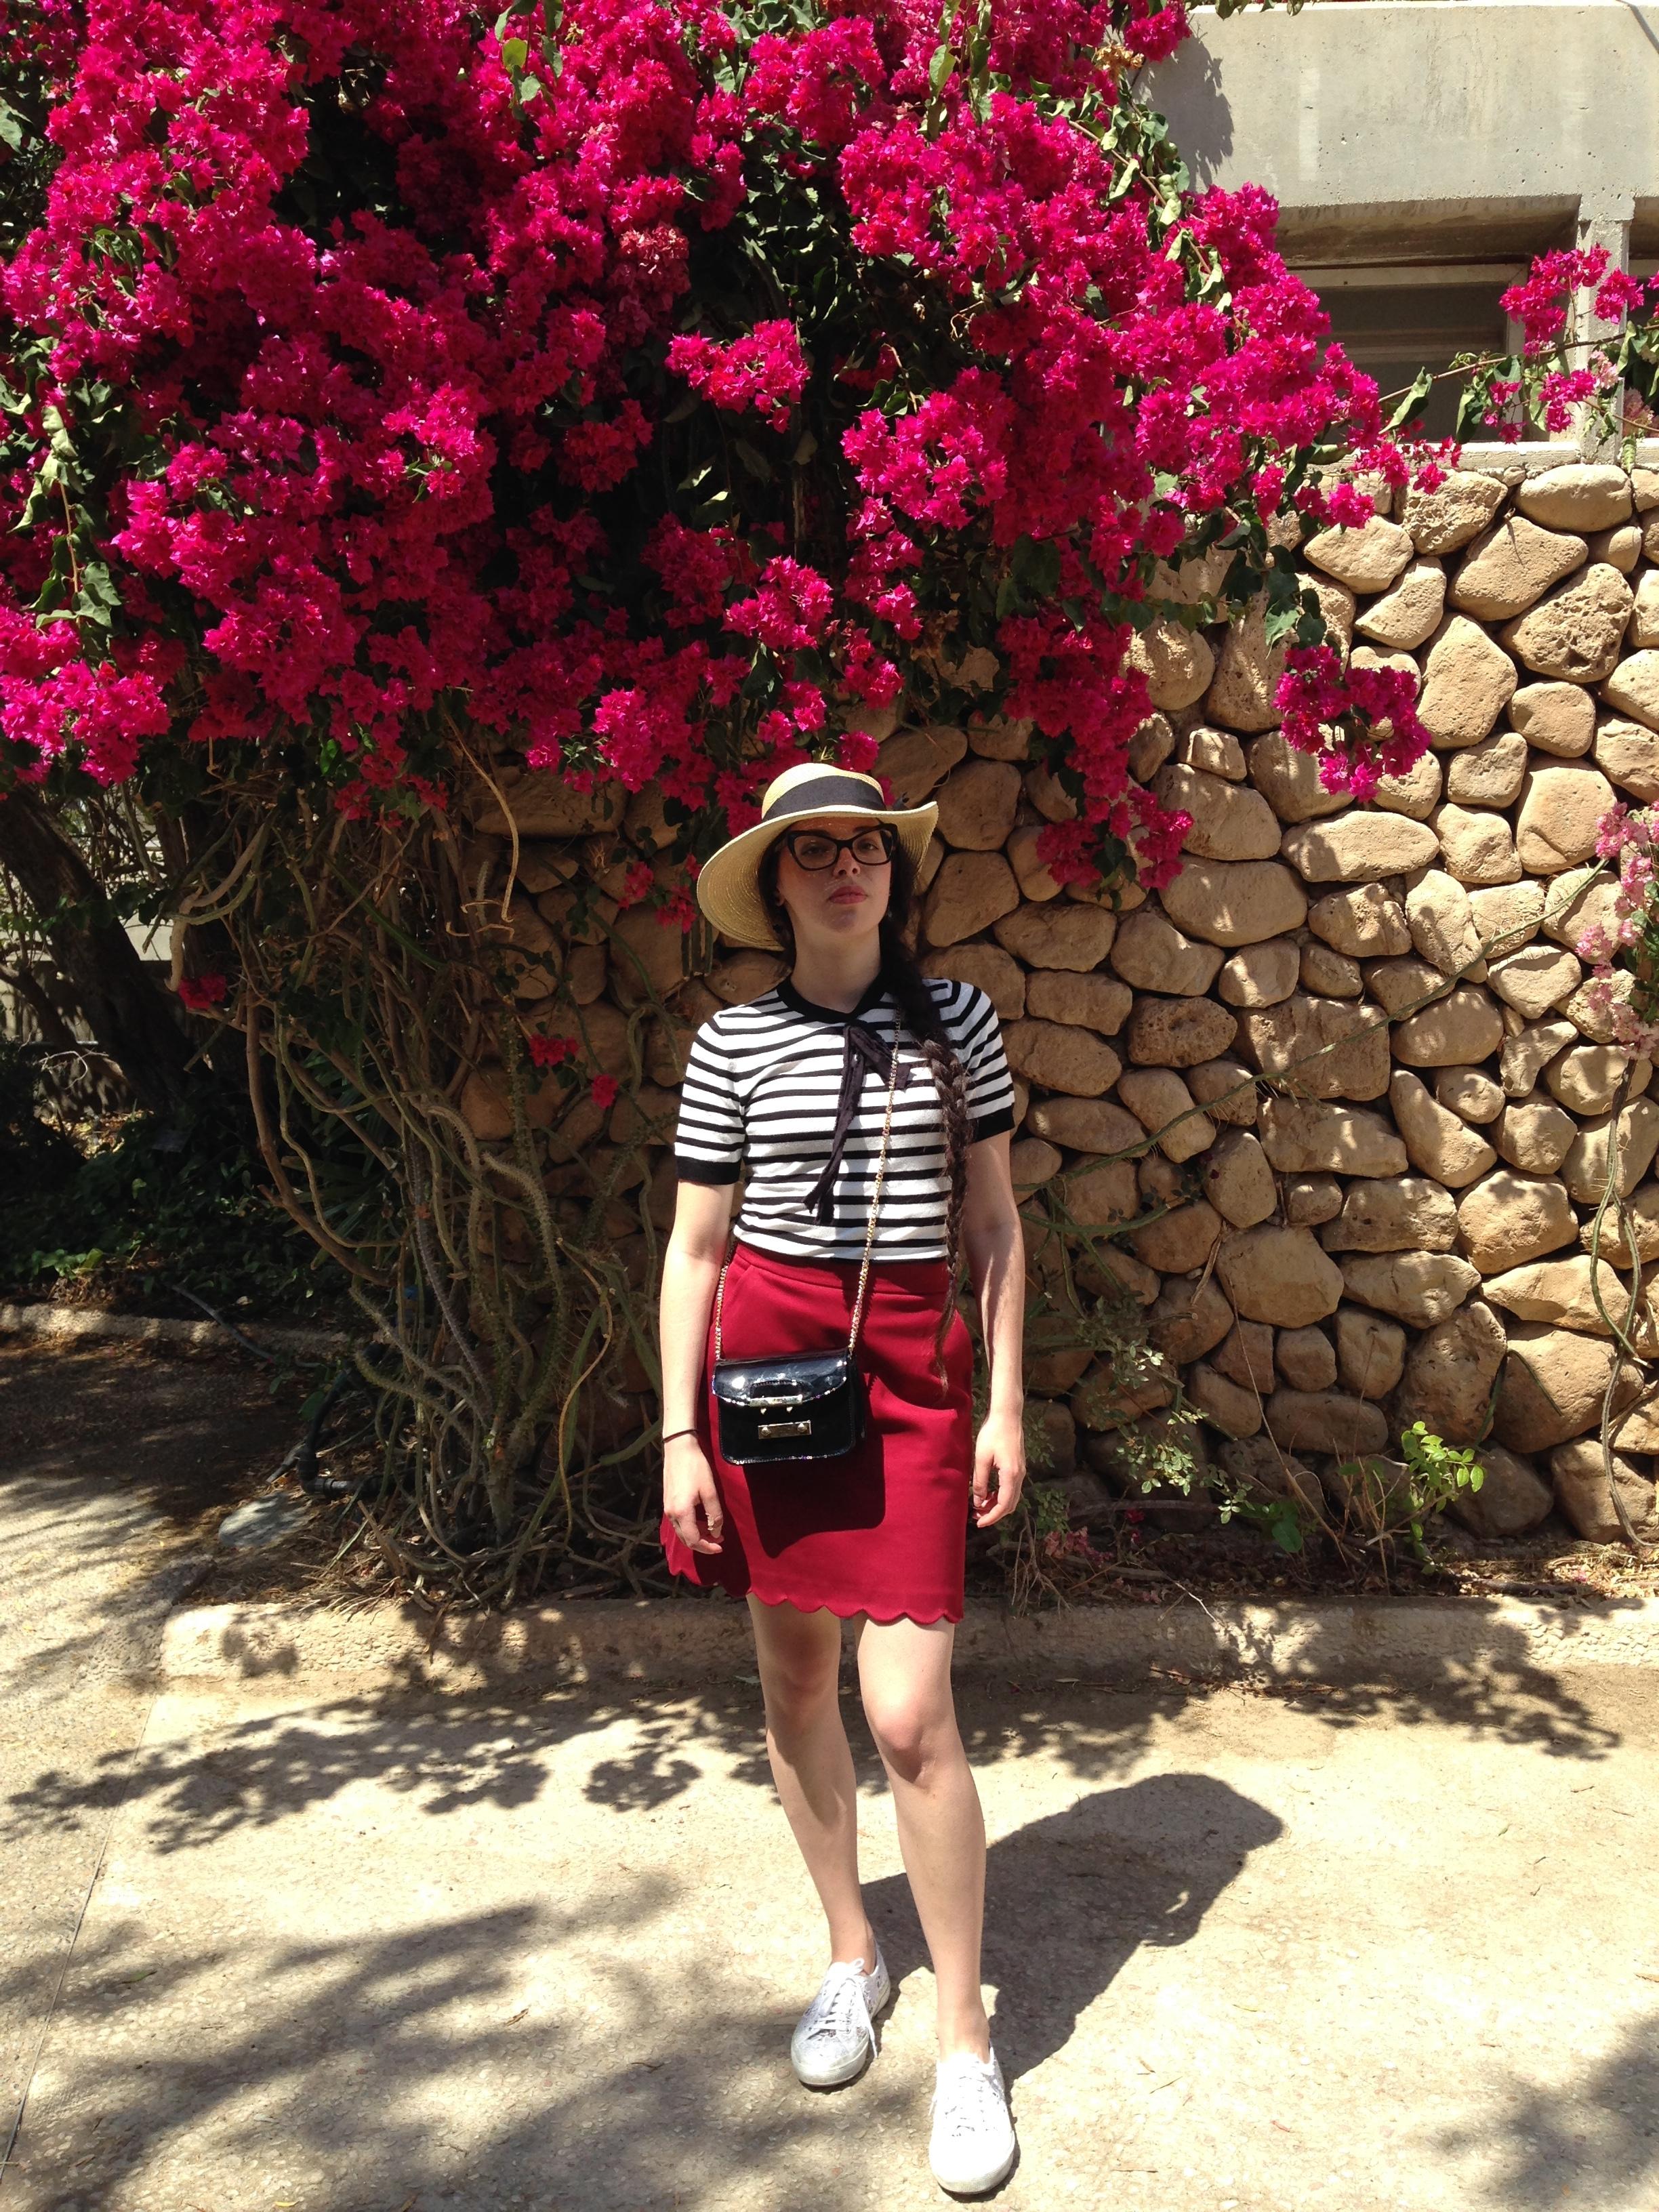 rocaille-blog-israel-dead-sea-ein-gedi-kibbutz-botanical-gardens